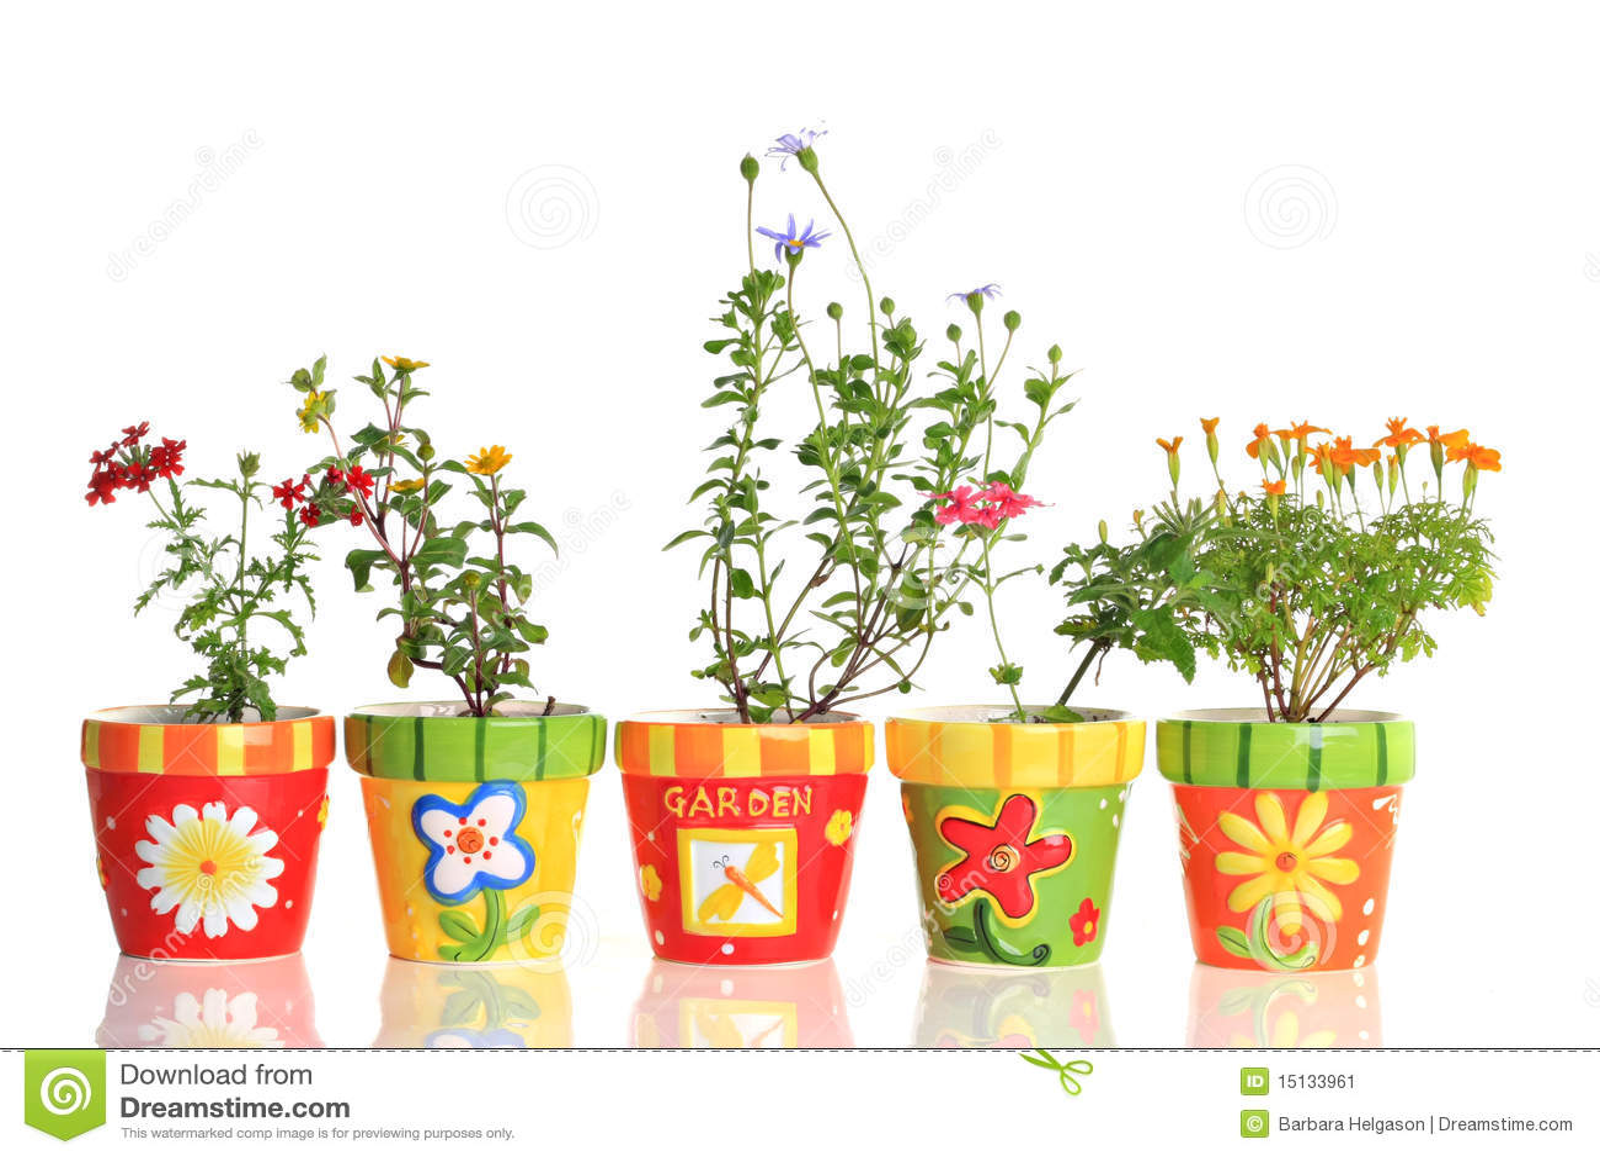 Pretty flower pots stock image Image of ceramic